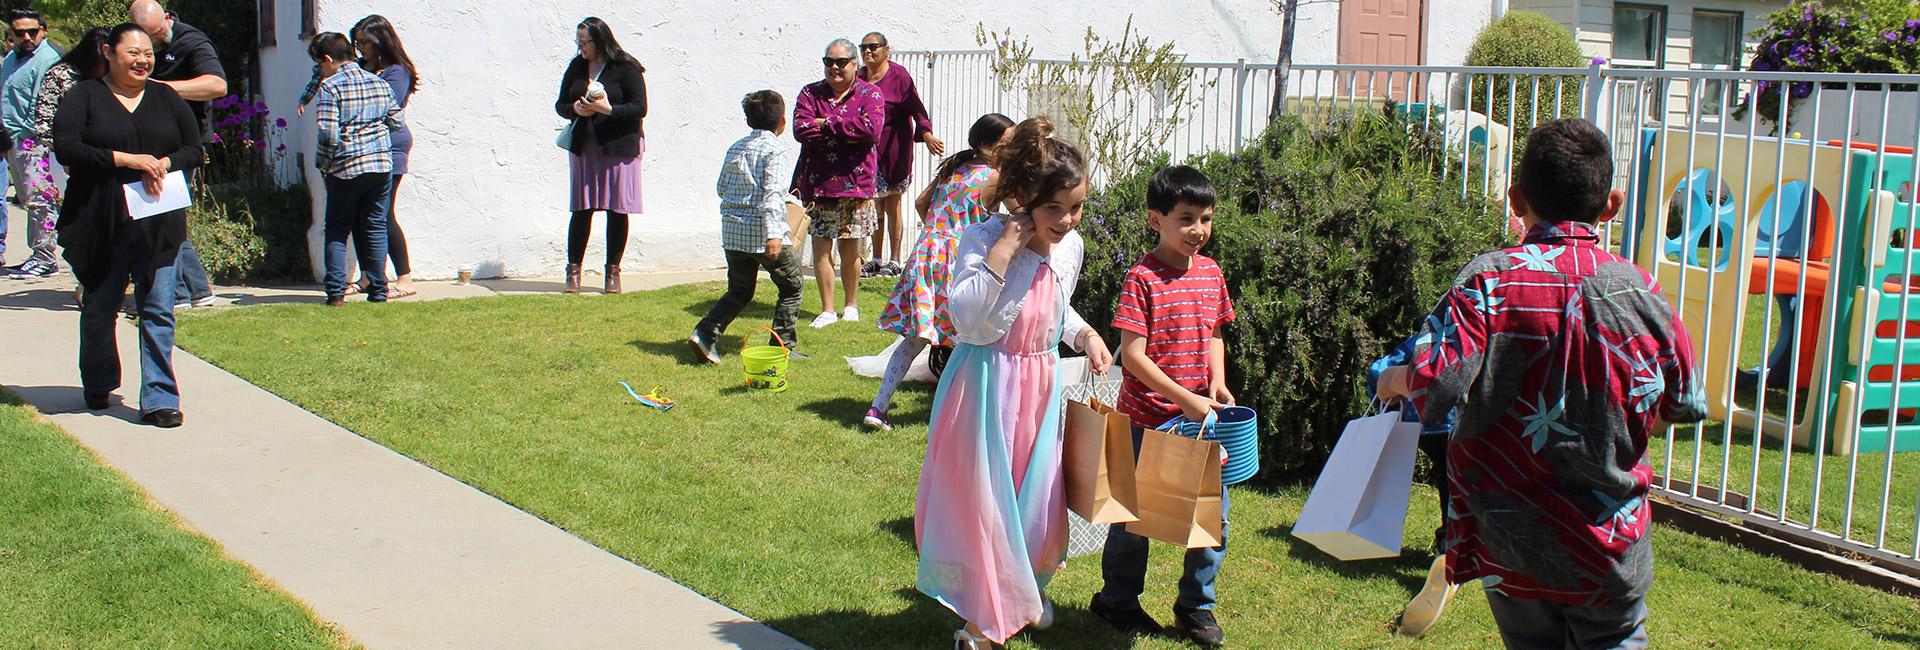 Kids running to get Easter eggs in Ventura